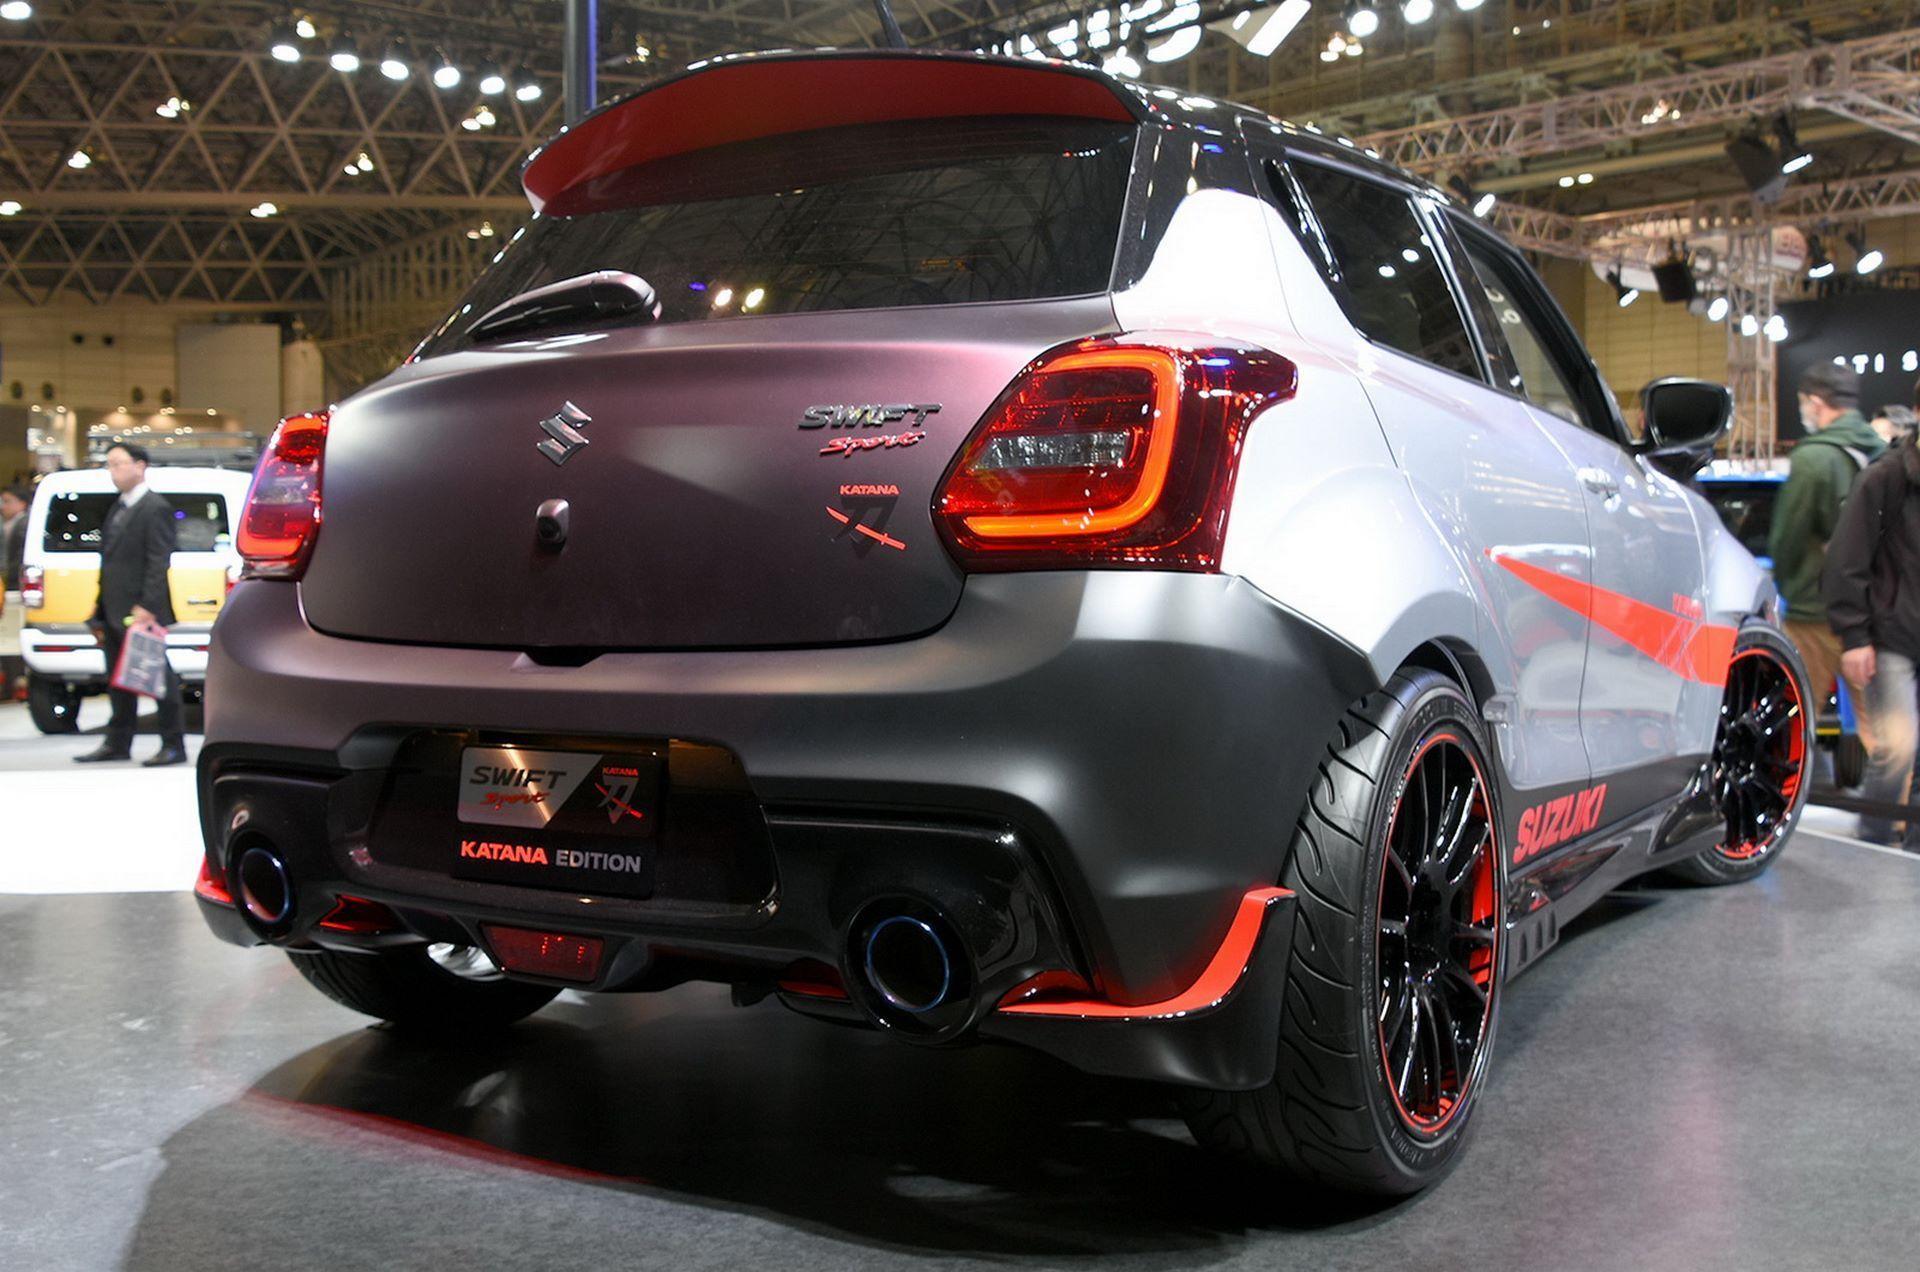 Suzuki-Swift-Sport-Katana-16